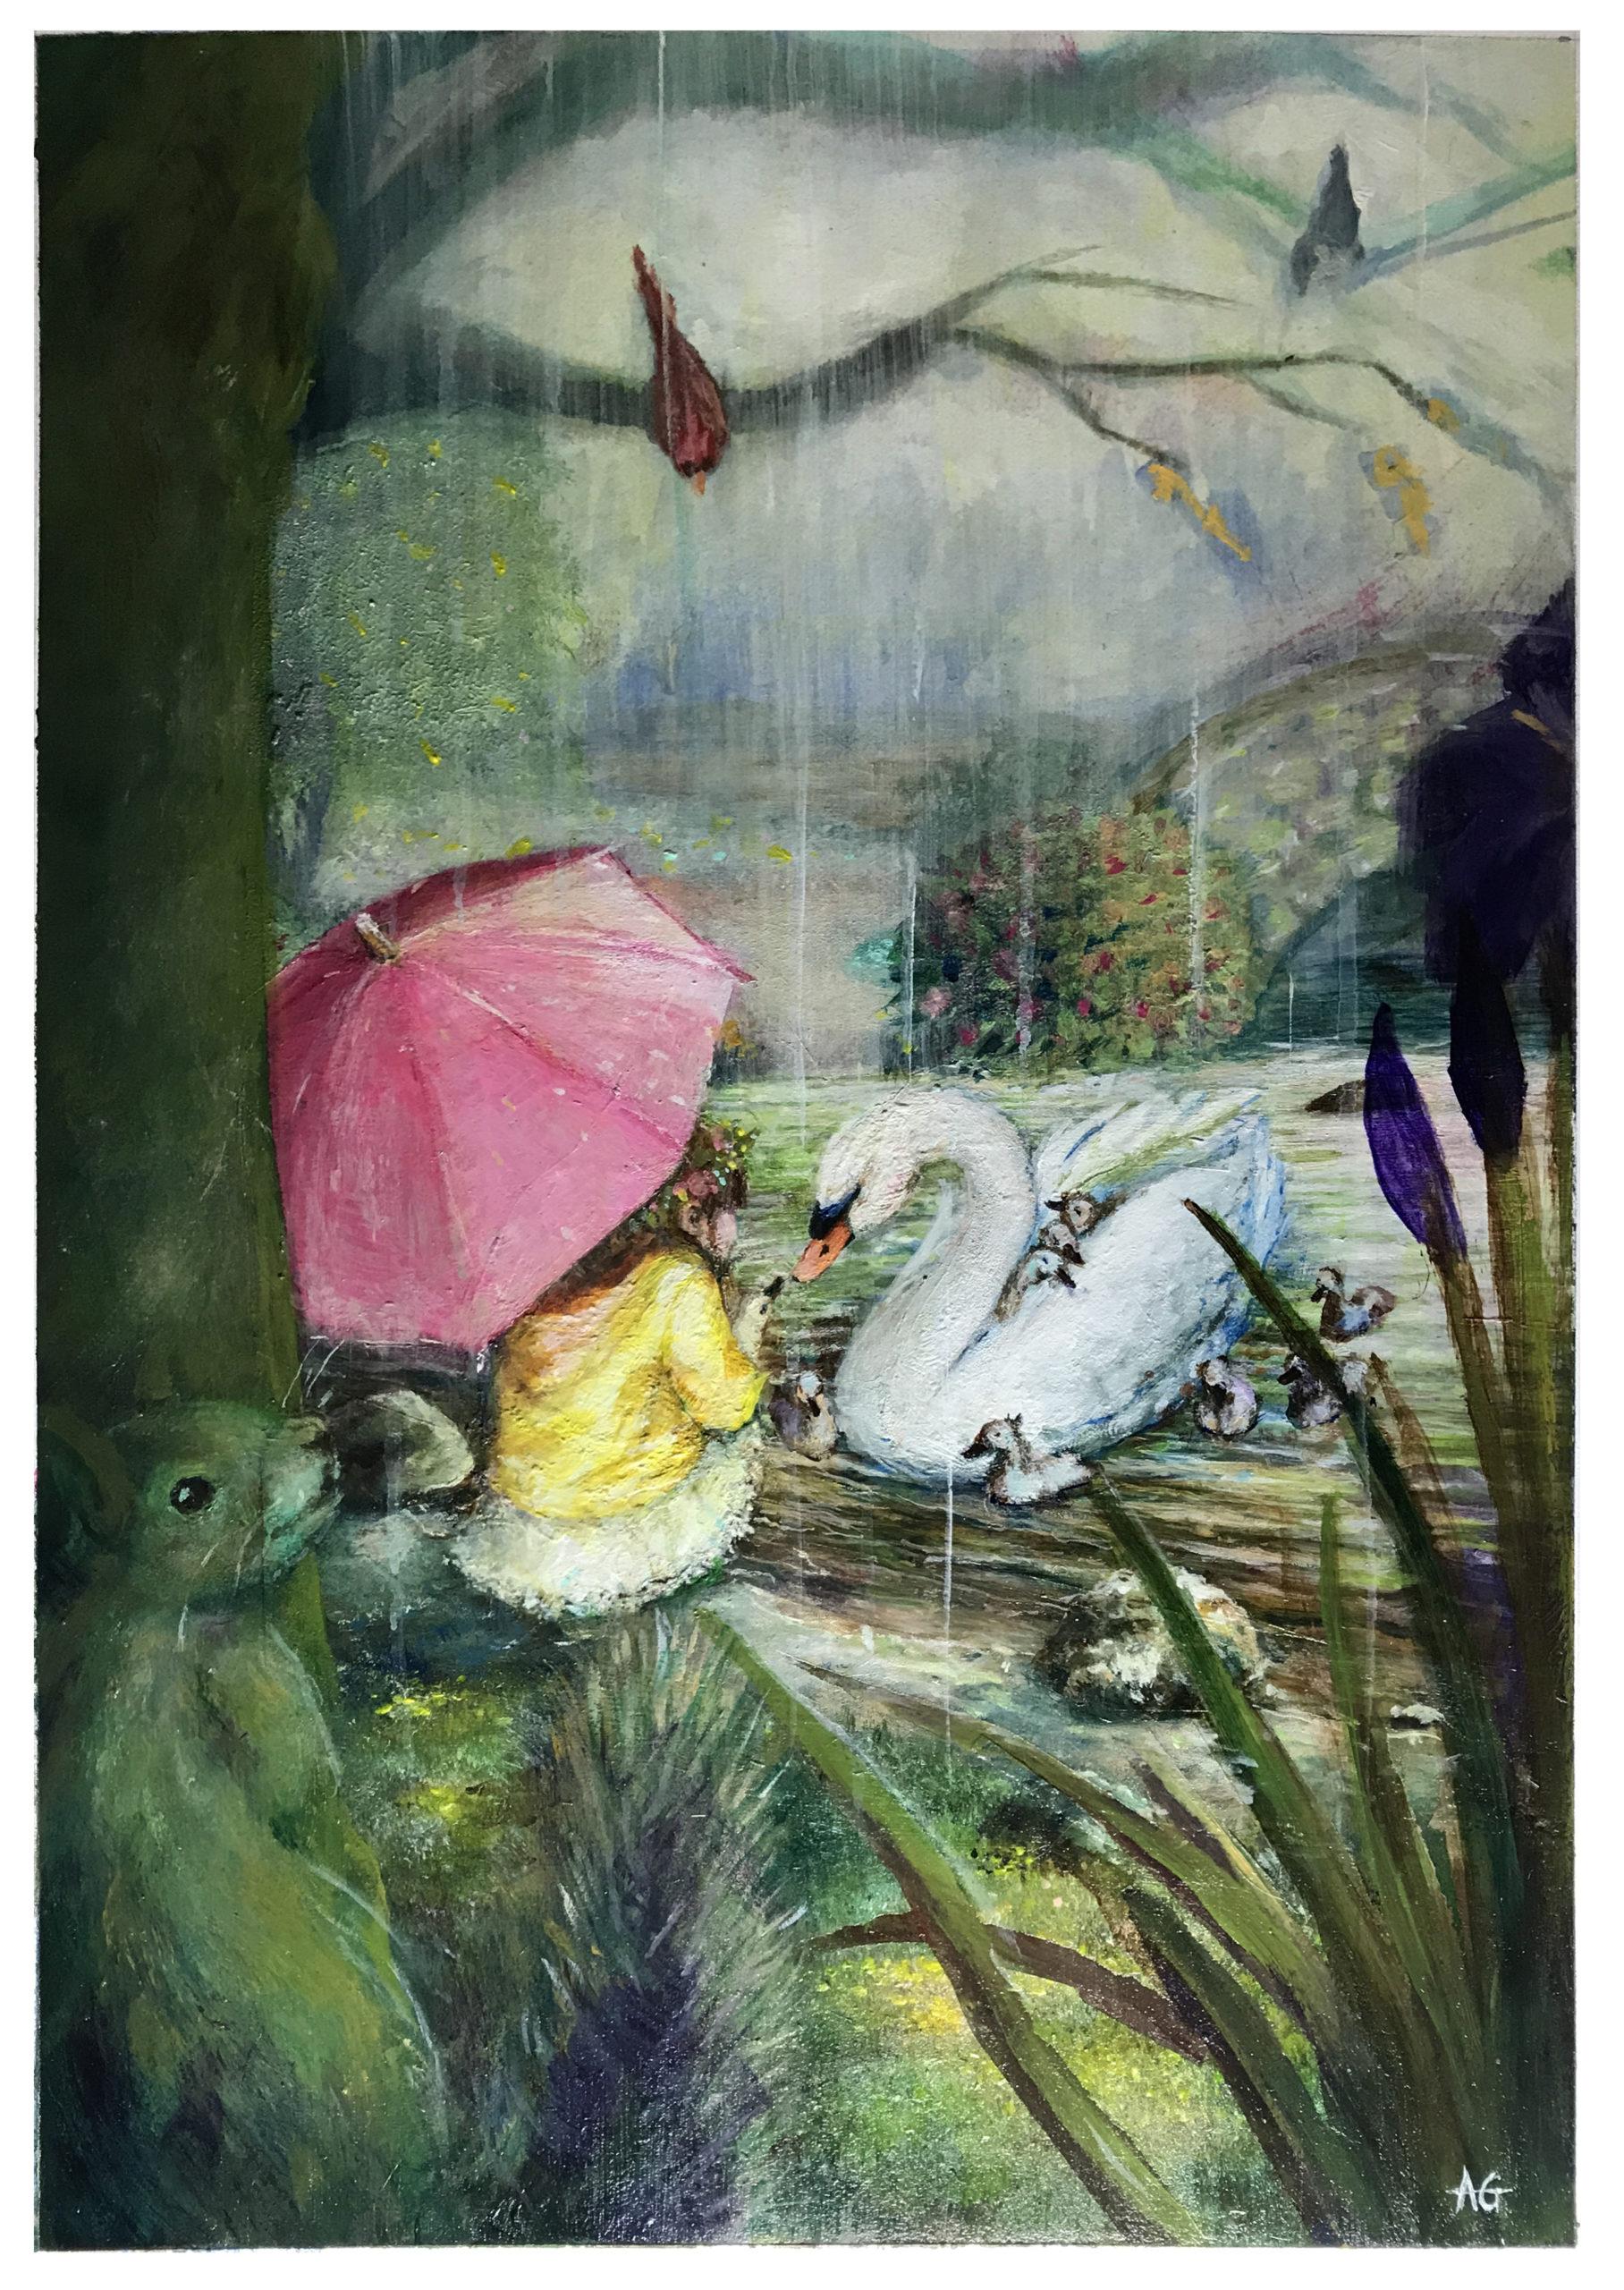 Vivaldi Four Seasons student artwork from MassArt, Amanda Godowski